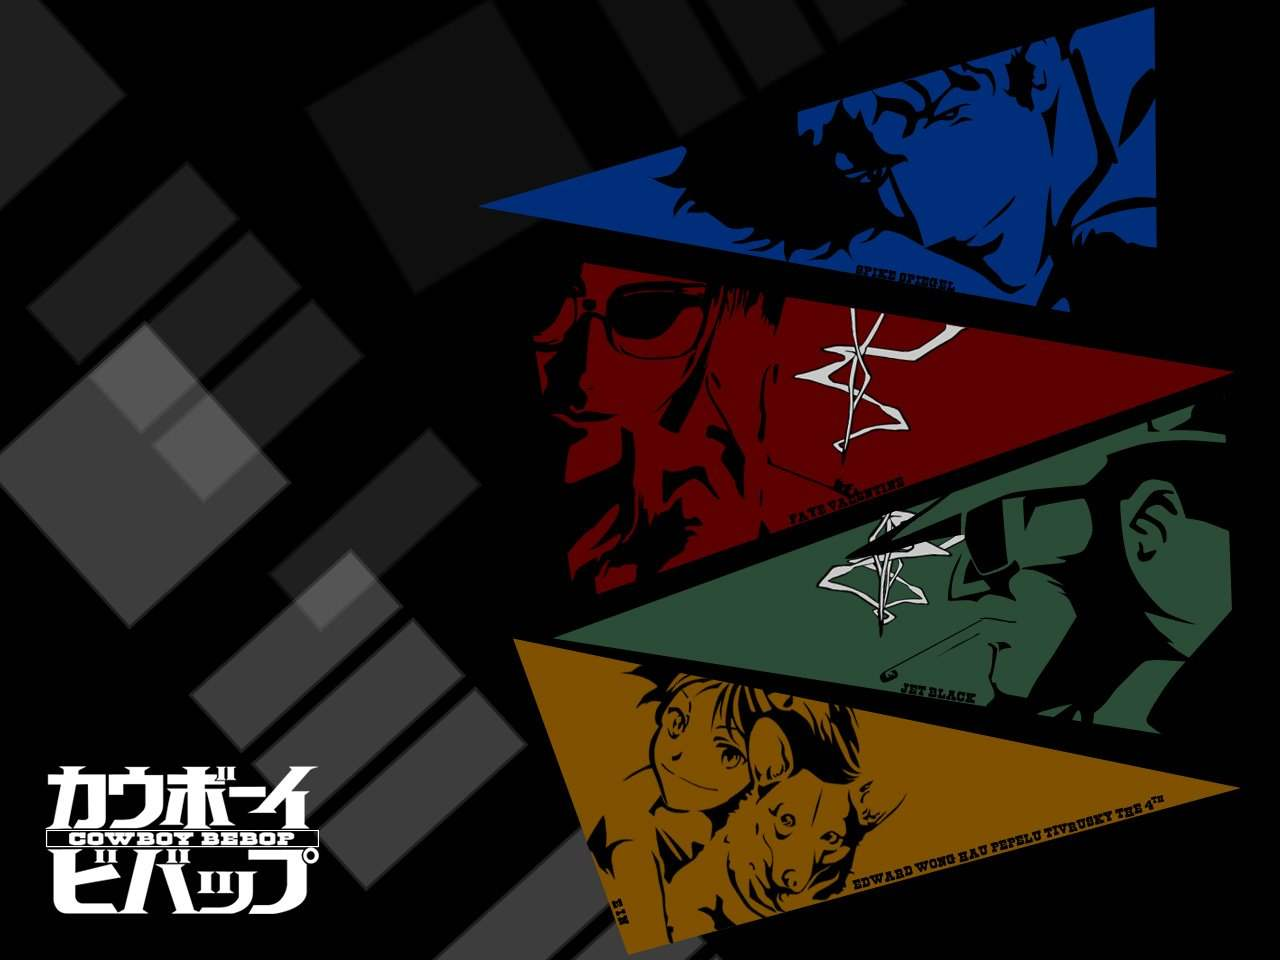 Download Edward Cowboy Bebop Wallpaper Anime Wallpapers 1280x960